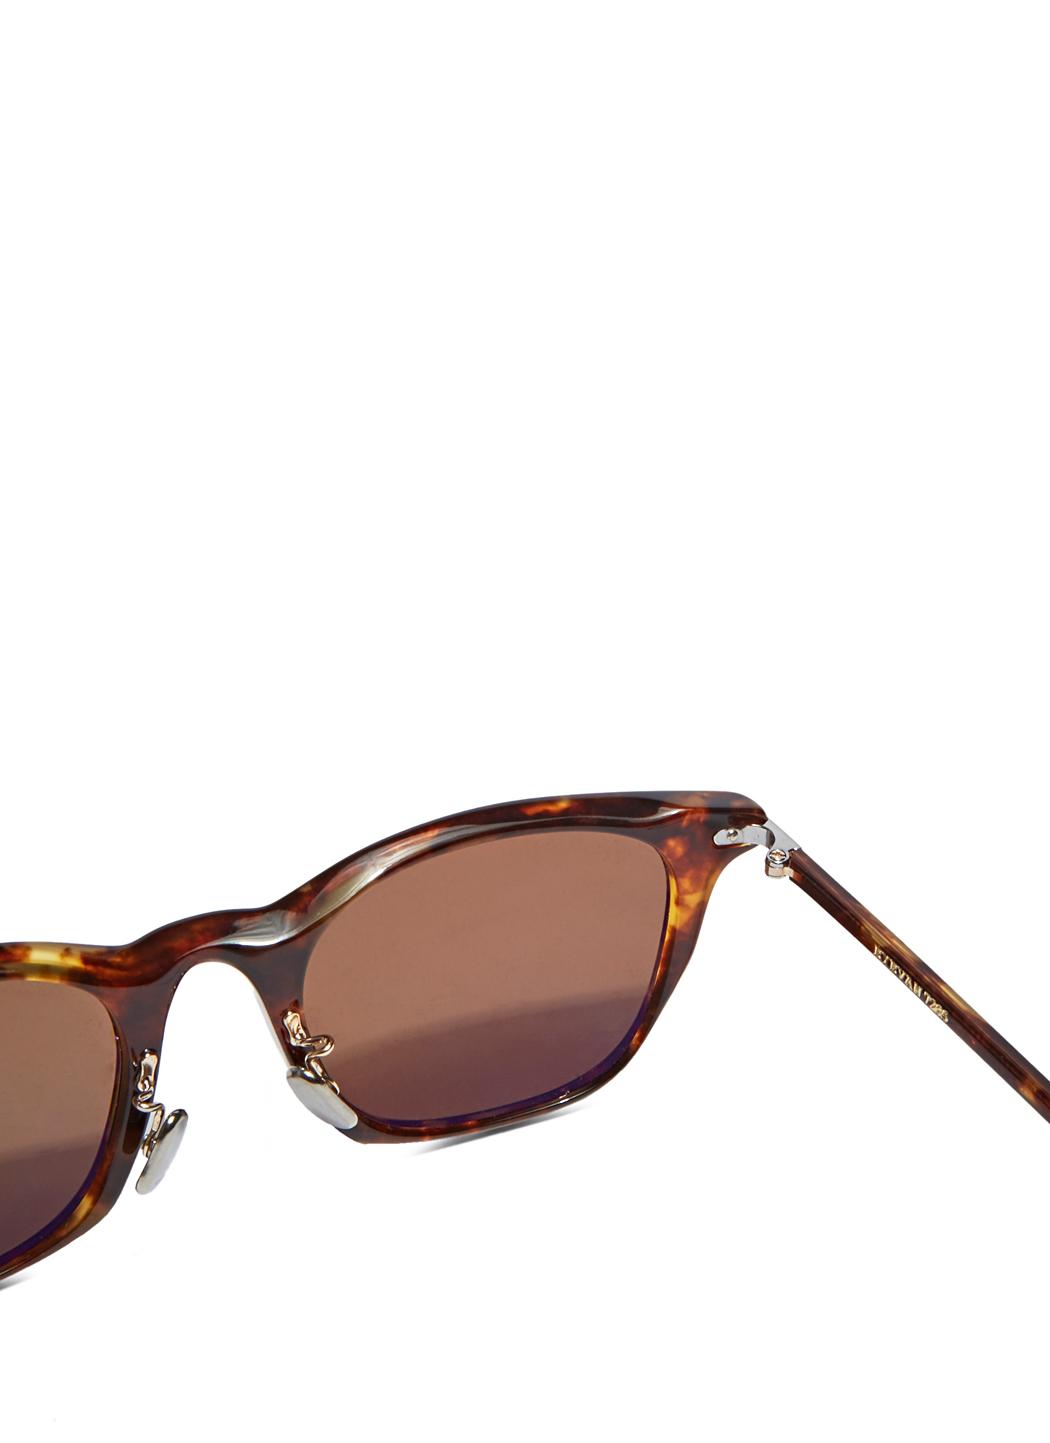 Silver and Purple Model 769 Sunglasses Eyevan 7285 uqpsT